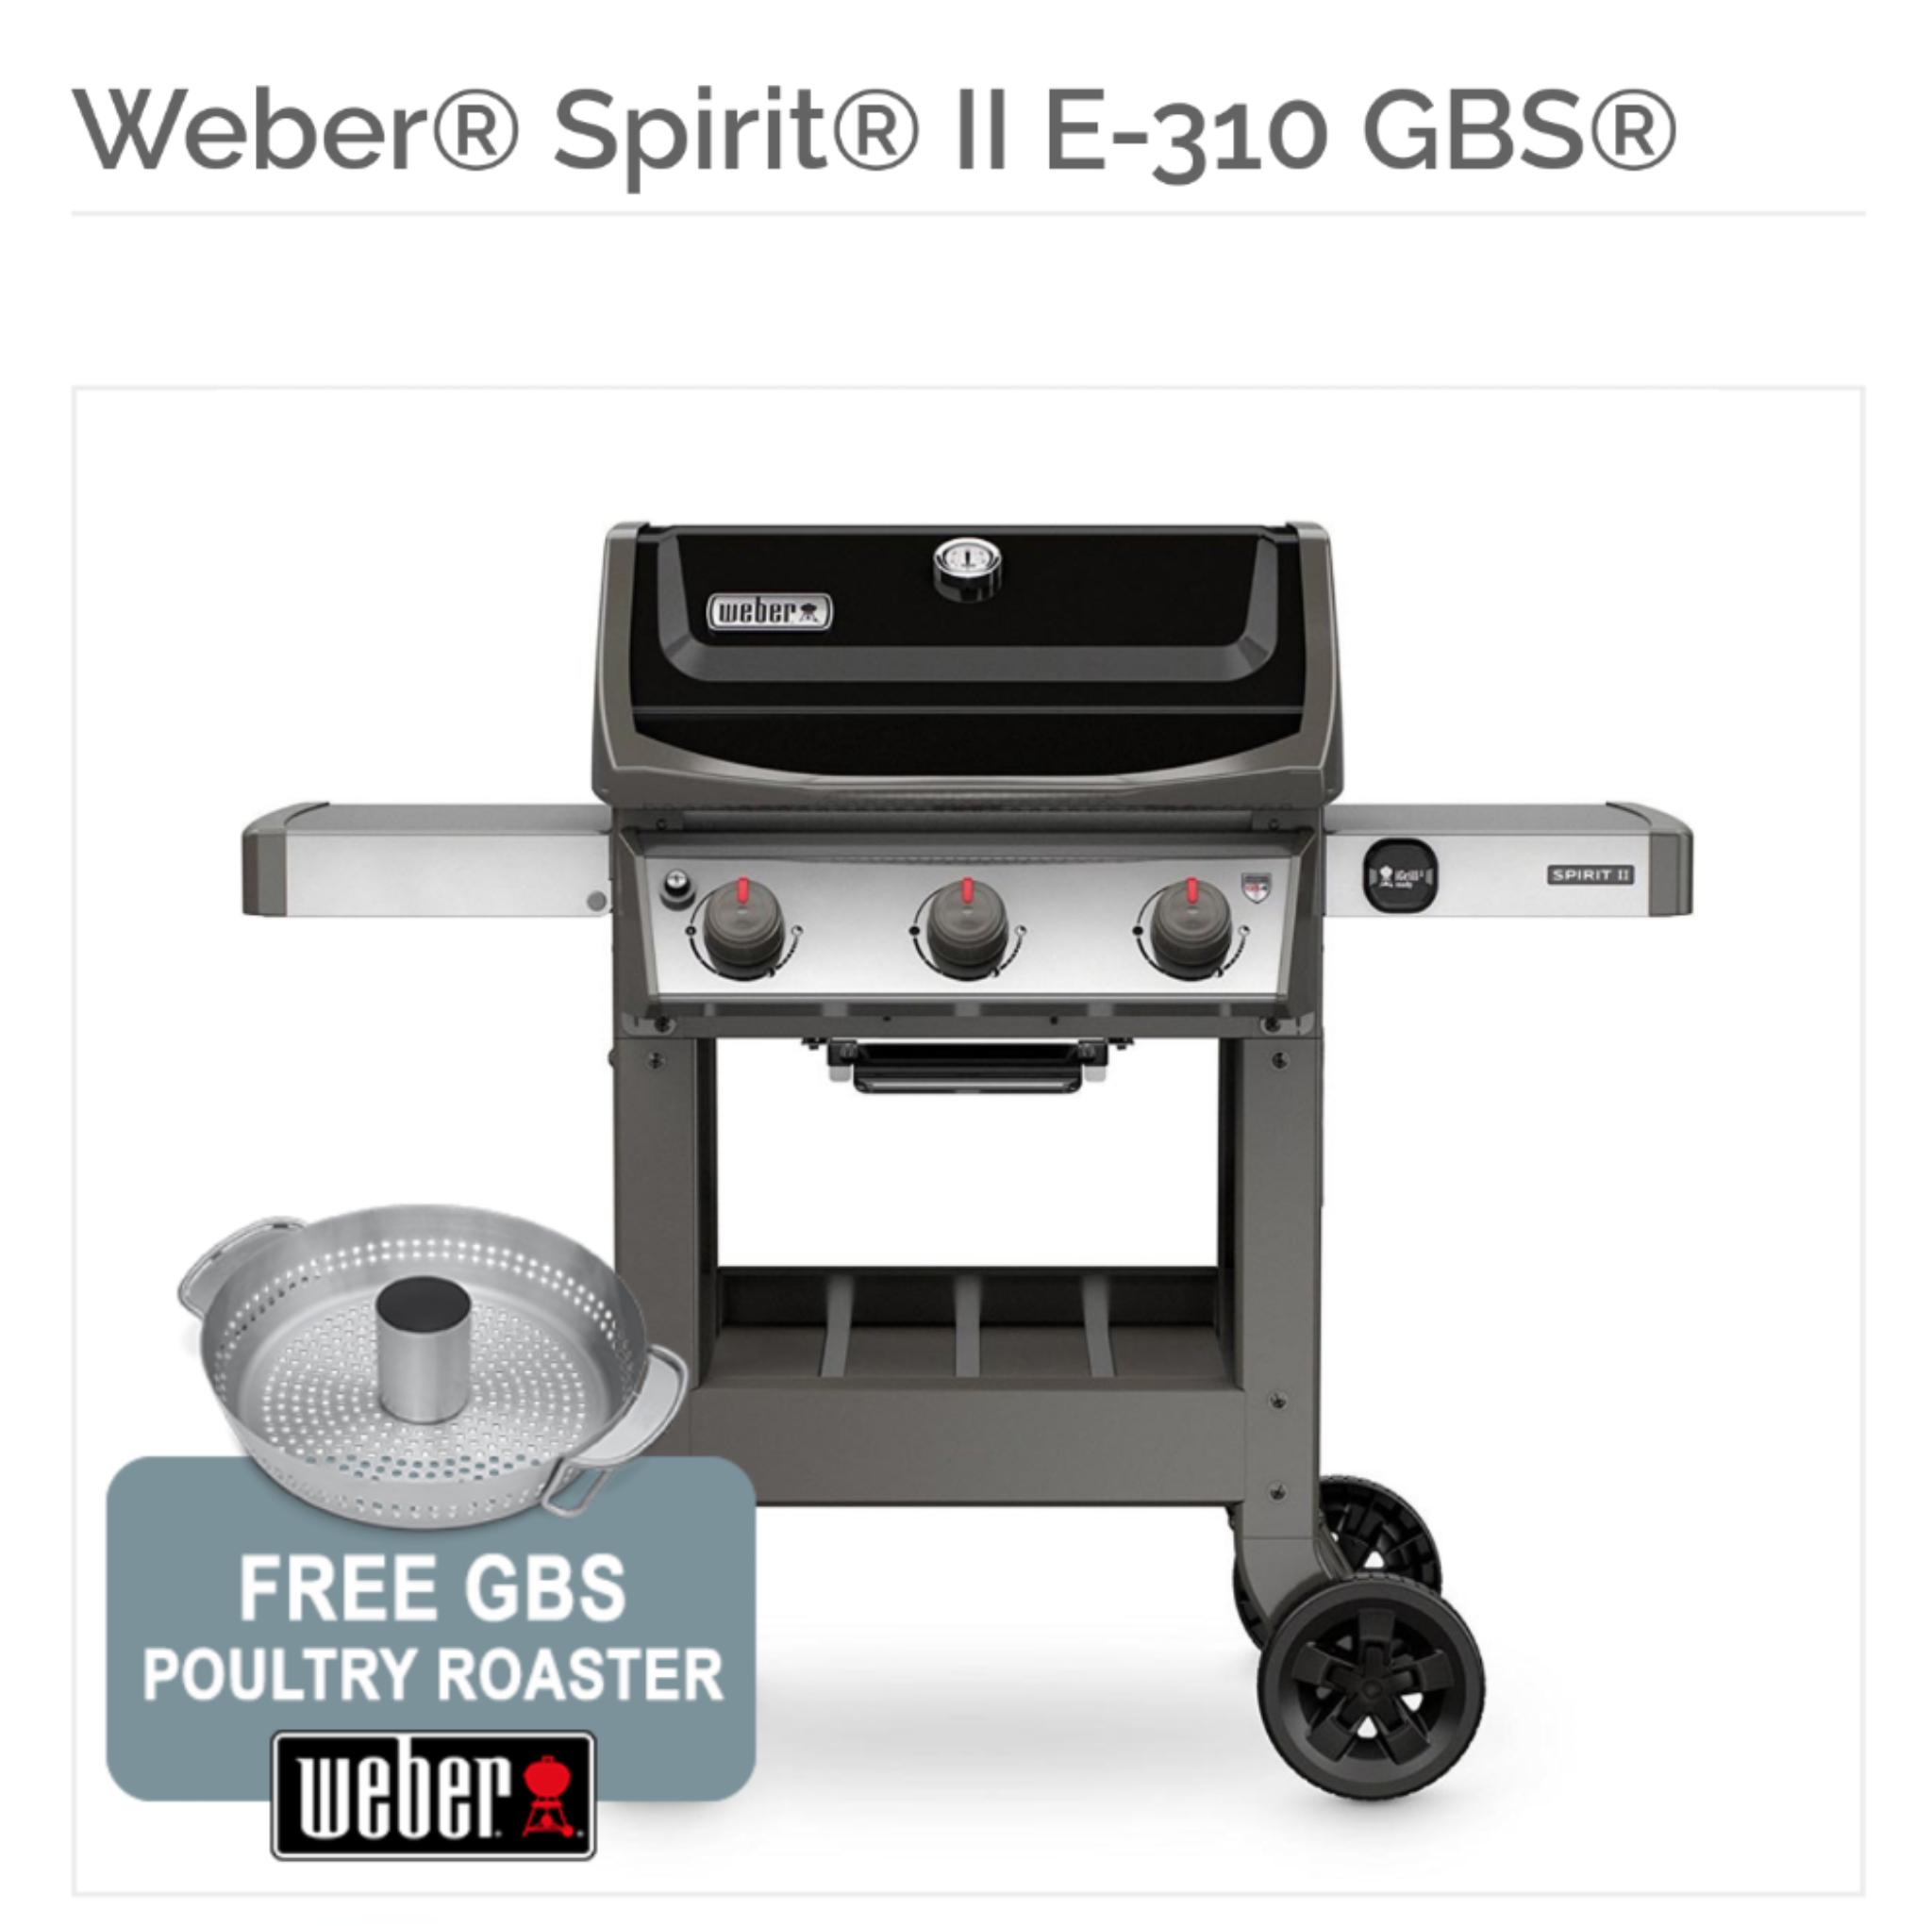 Weber Spirit II E-310 Today Only at Riverside Garden Centre - £503.50